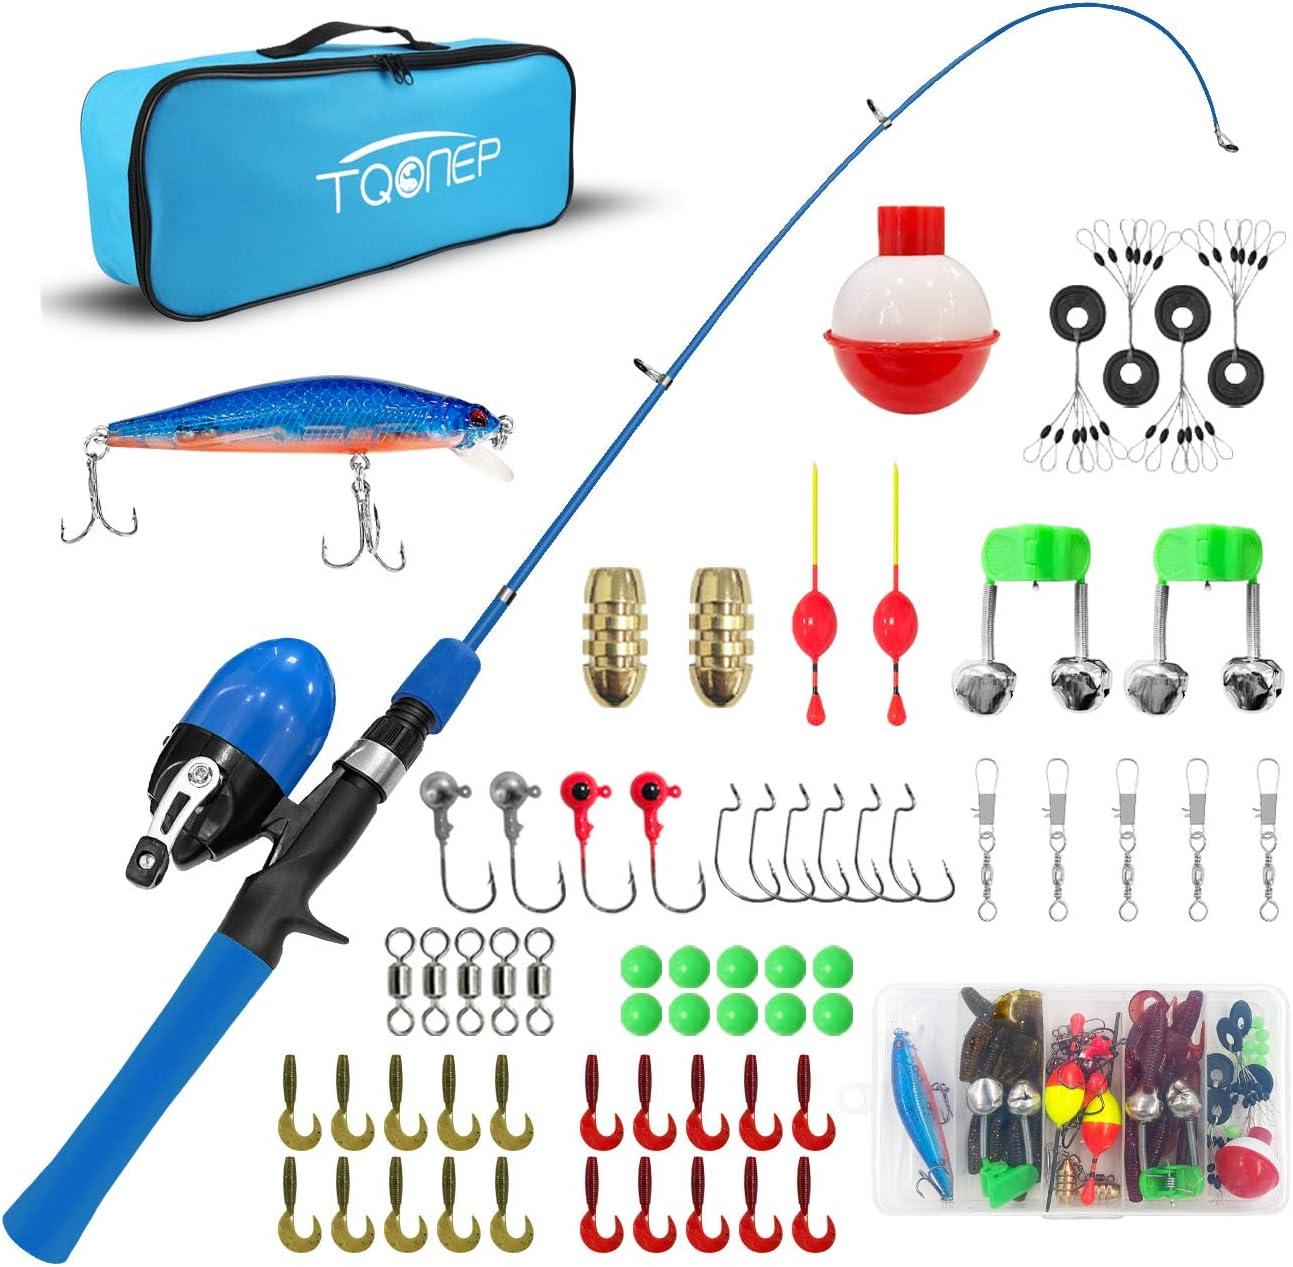 TQONEP trend rank Kids Fishing Pole with Reel f Tackle Finally popular brand Spincast Box